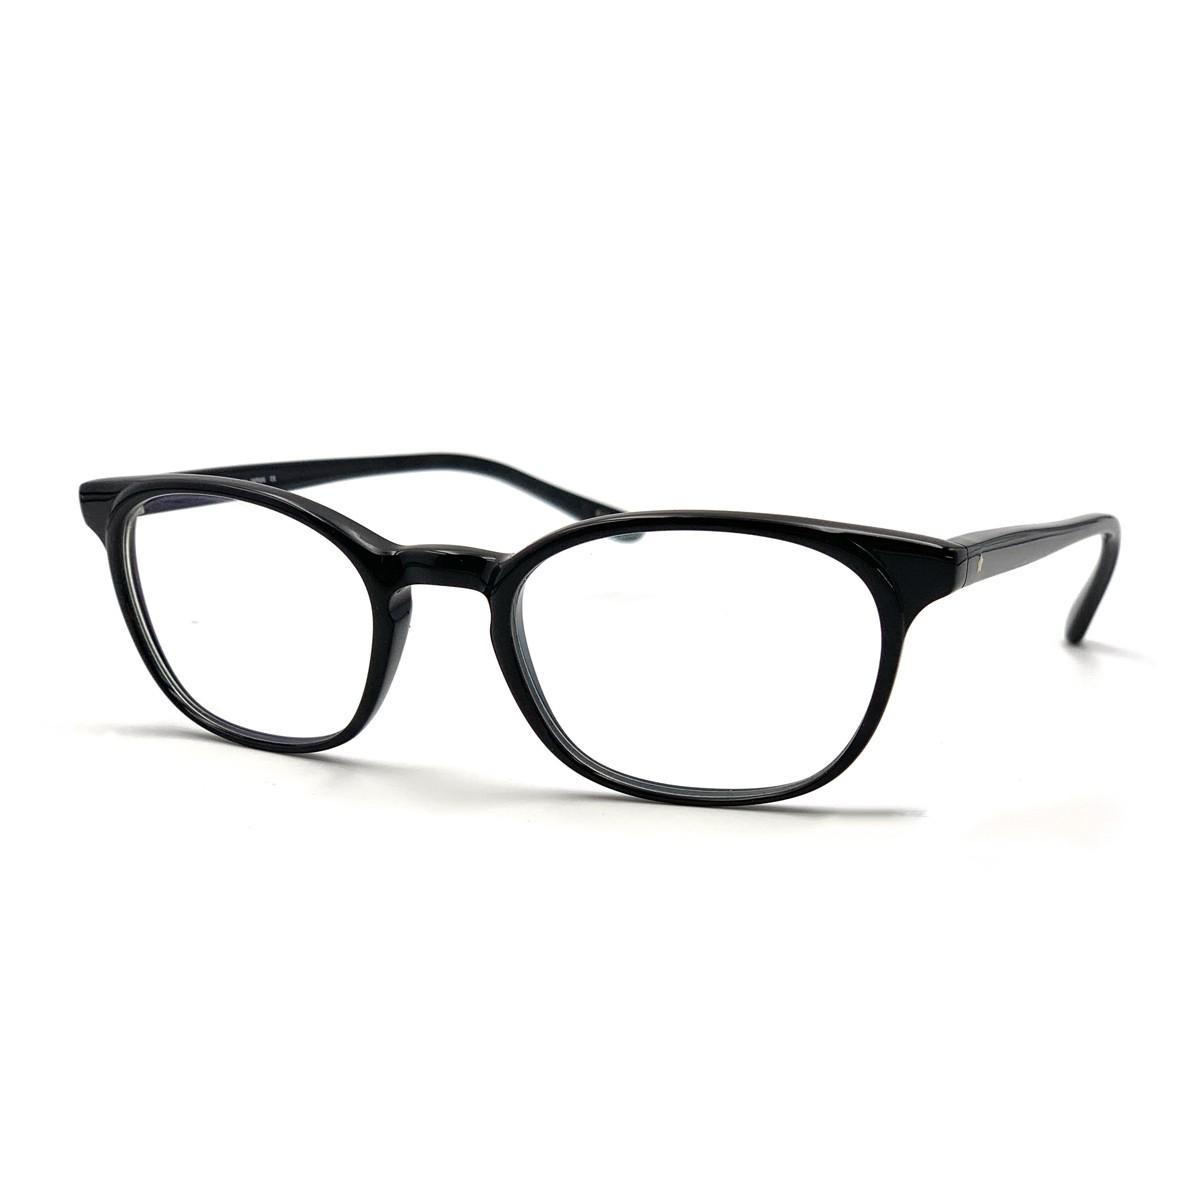 Masunaga GMS-00 | Men's eyeglasses